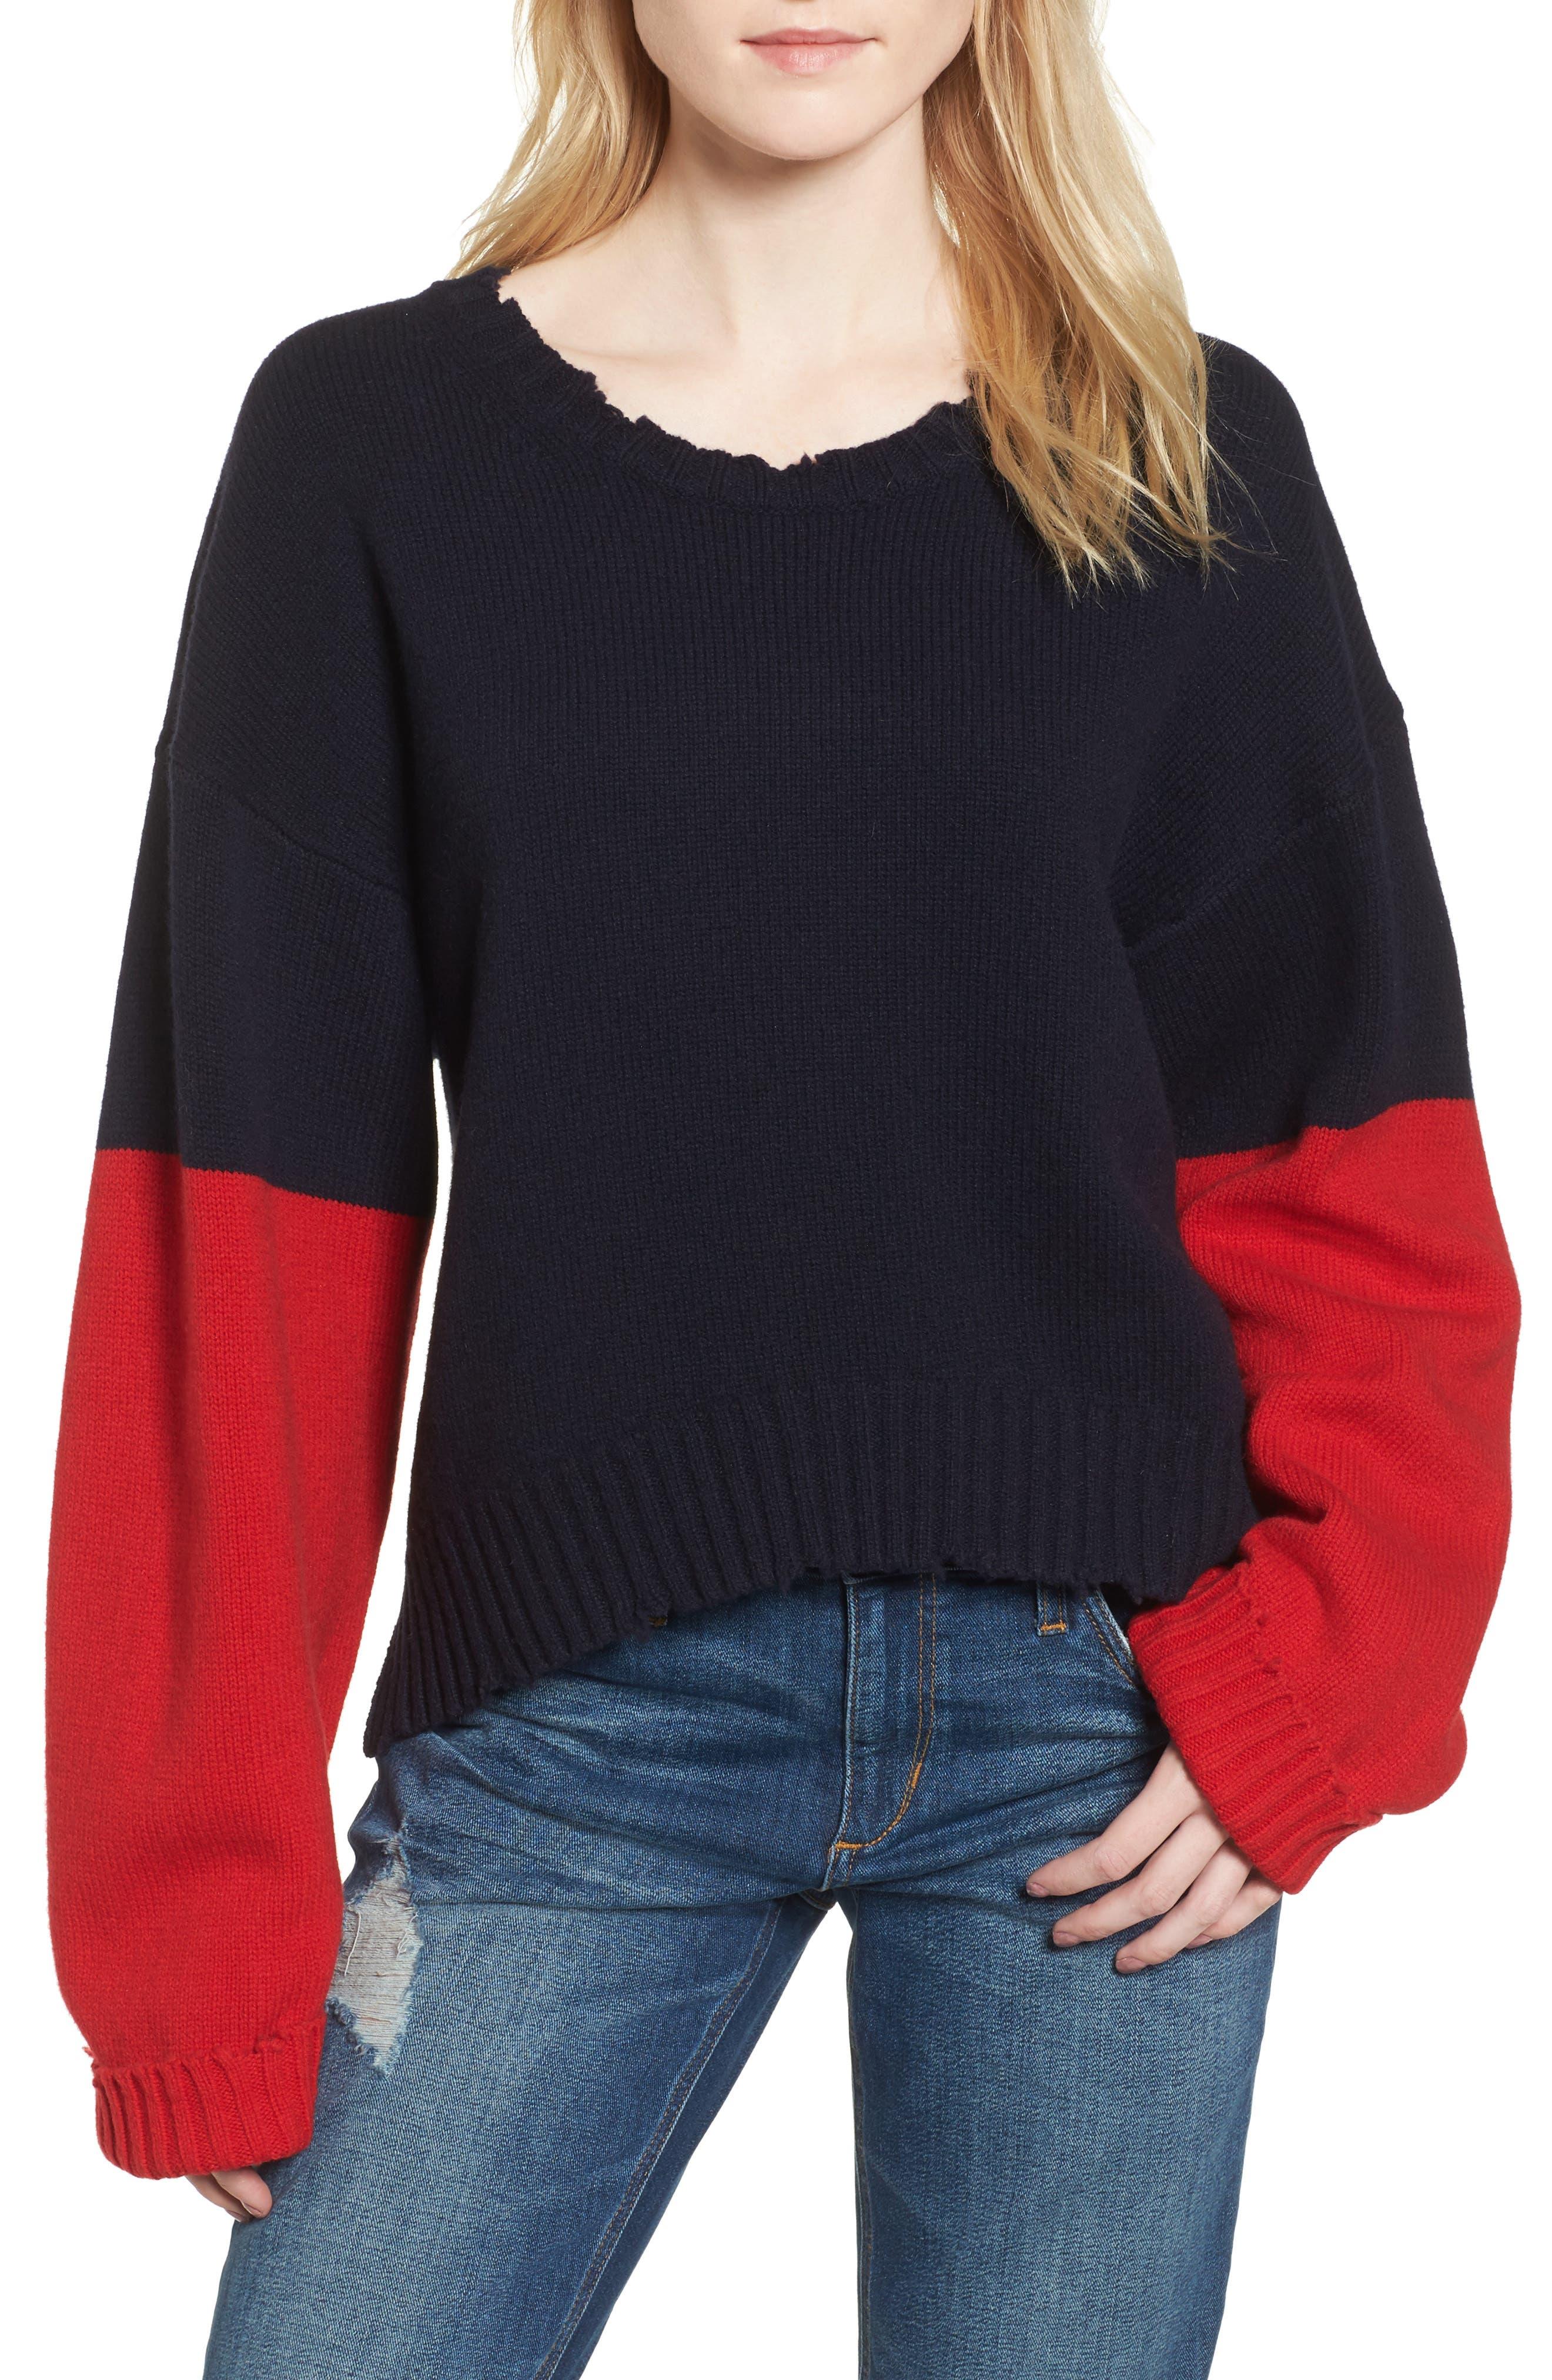 Zadig & Voltaire Clarys Sweater